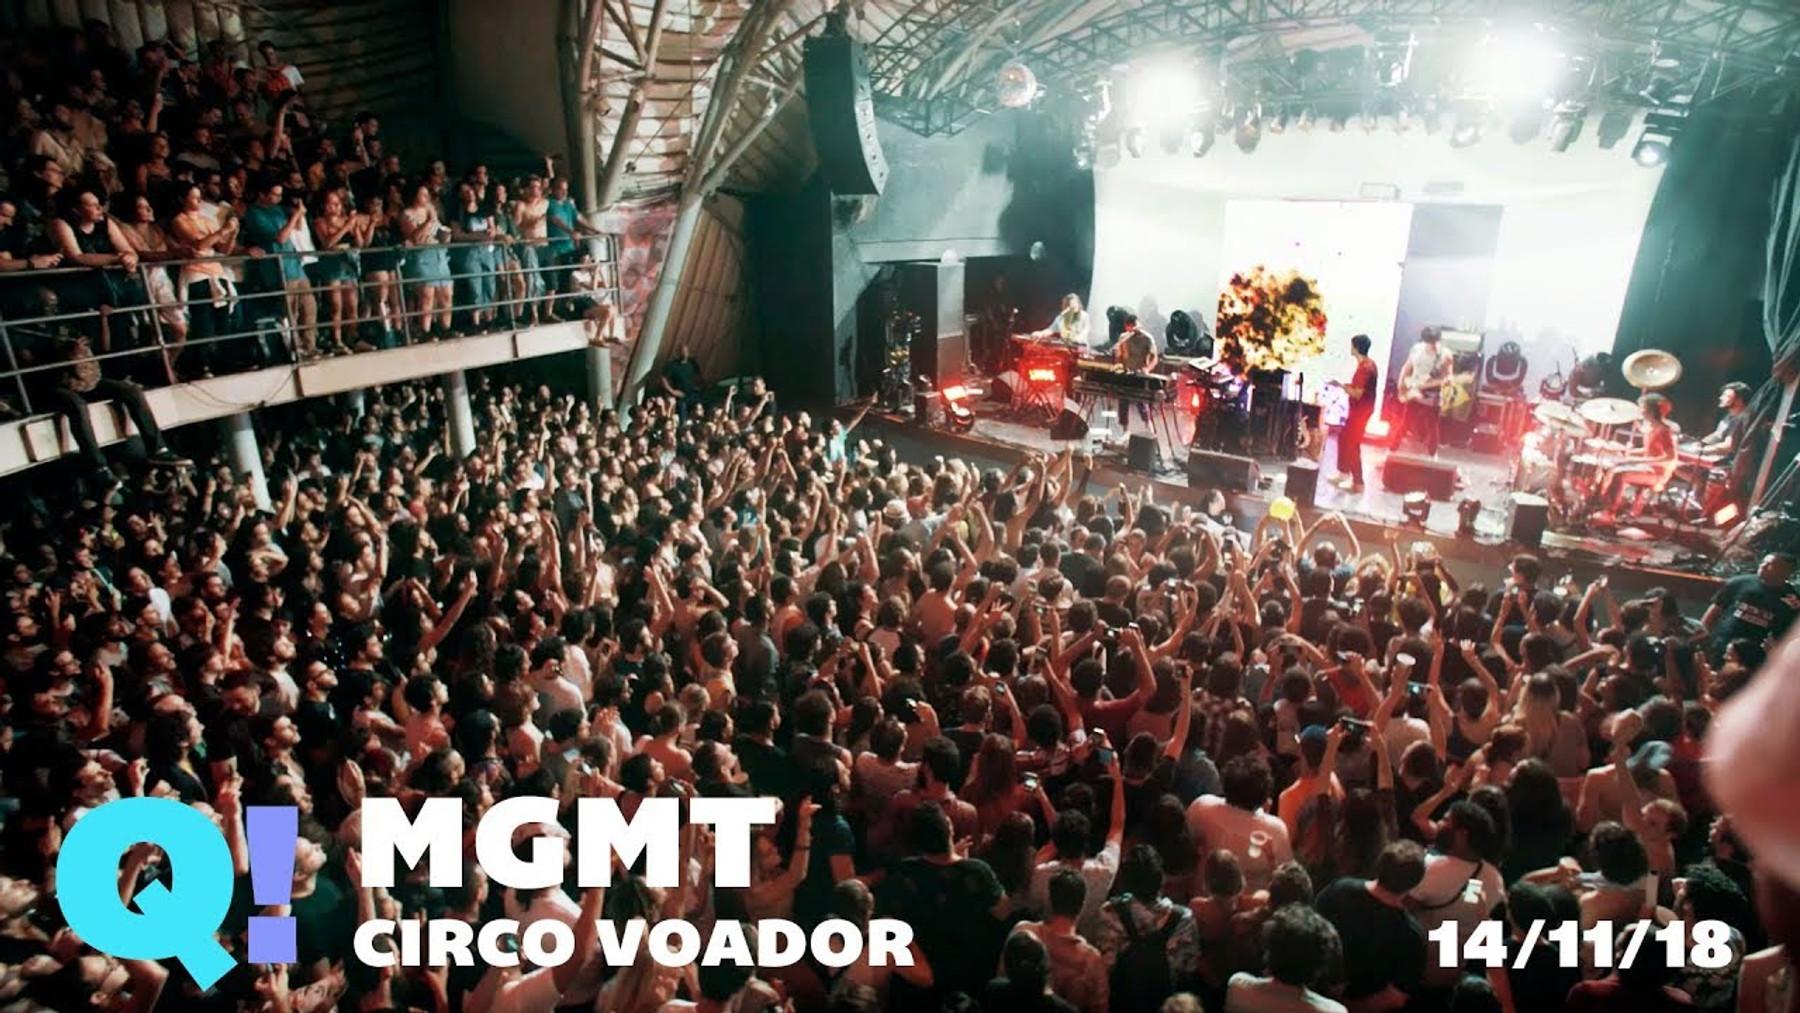 Queremos MGMT Rio